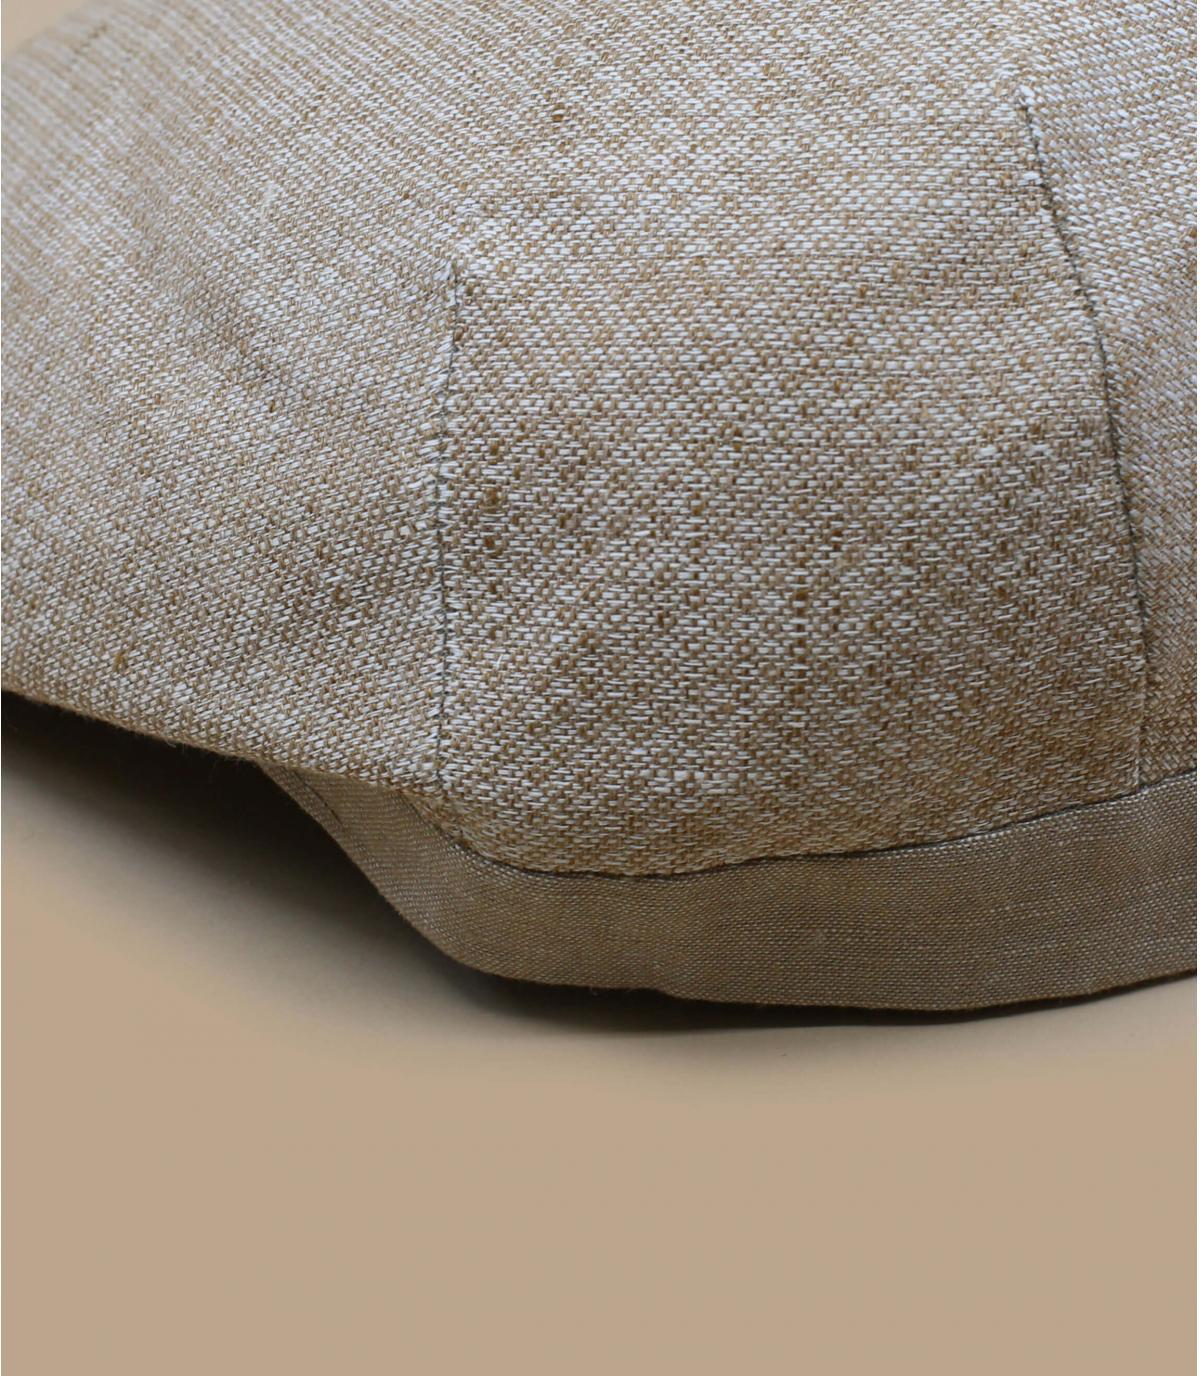 Details Rayan beige - Abbildung 2